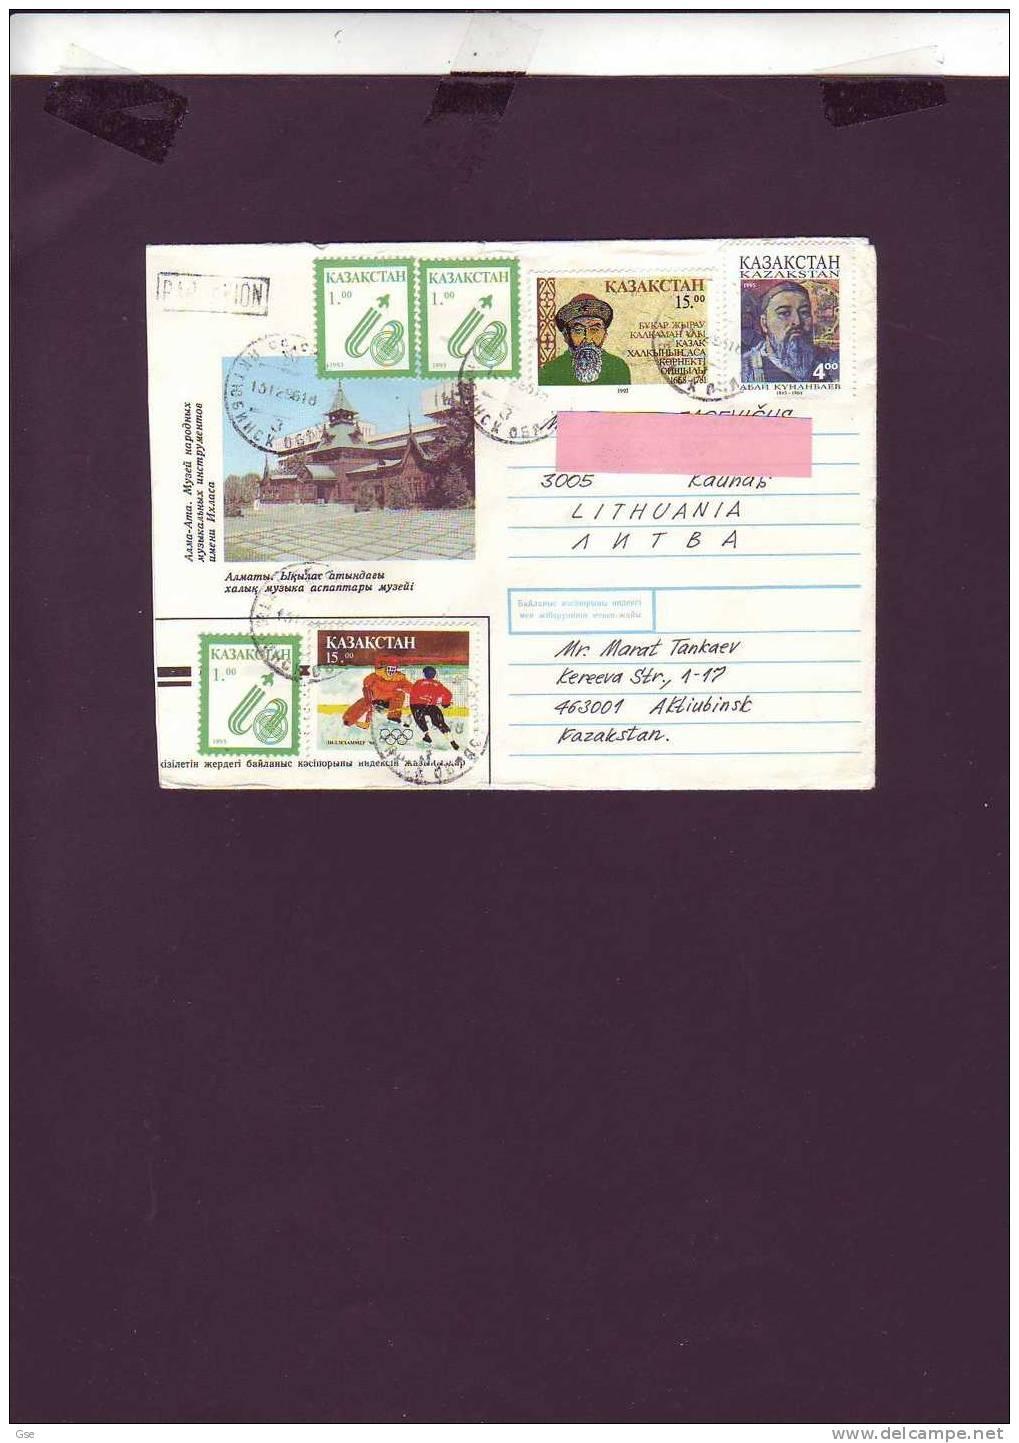 KAZAKISTAN 1996 - Lettera  Per La Lituania (olimpiadi) - Kasachstan